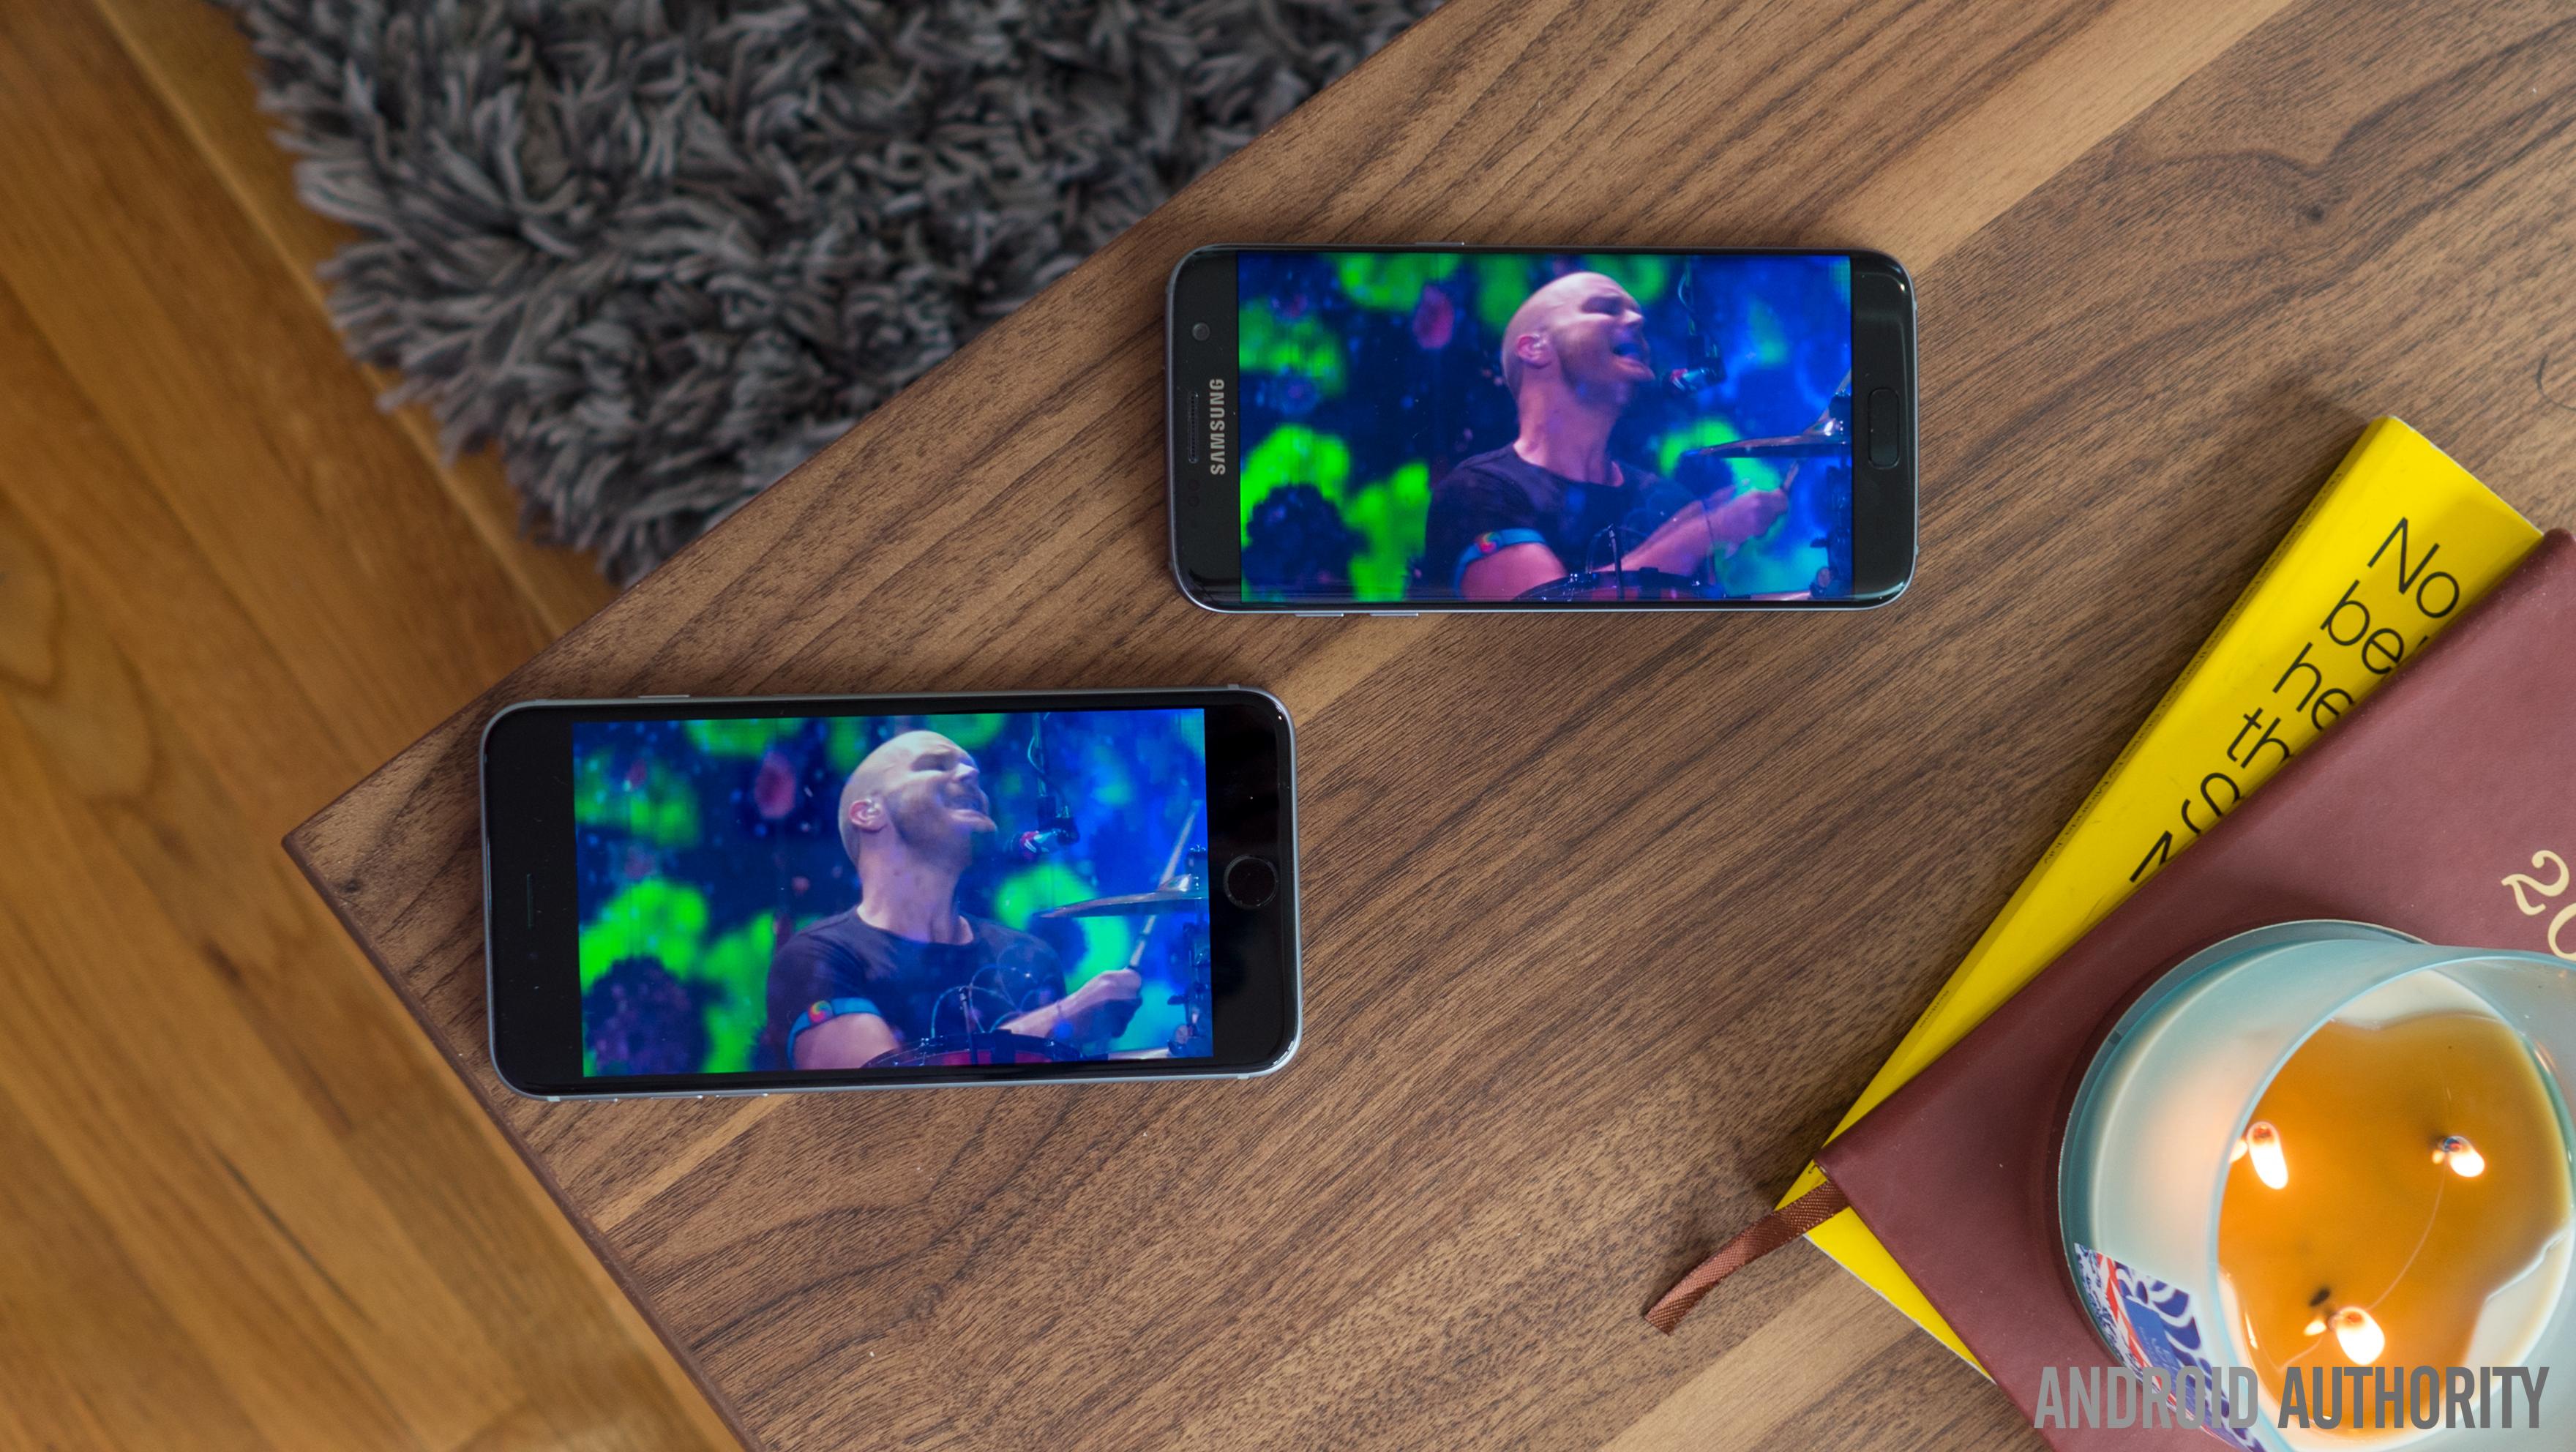 Galaxy-S7-Edge-vs-iPhone-6s-plus-8of18